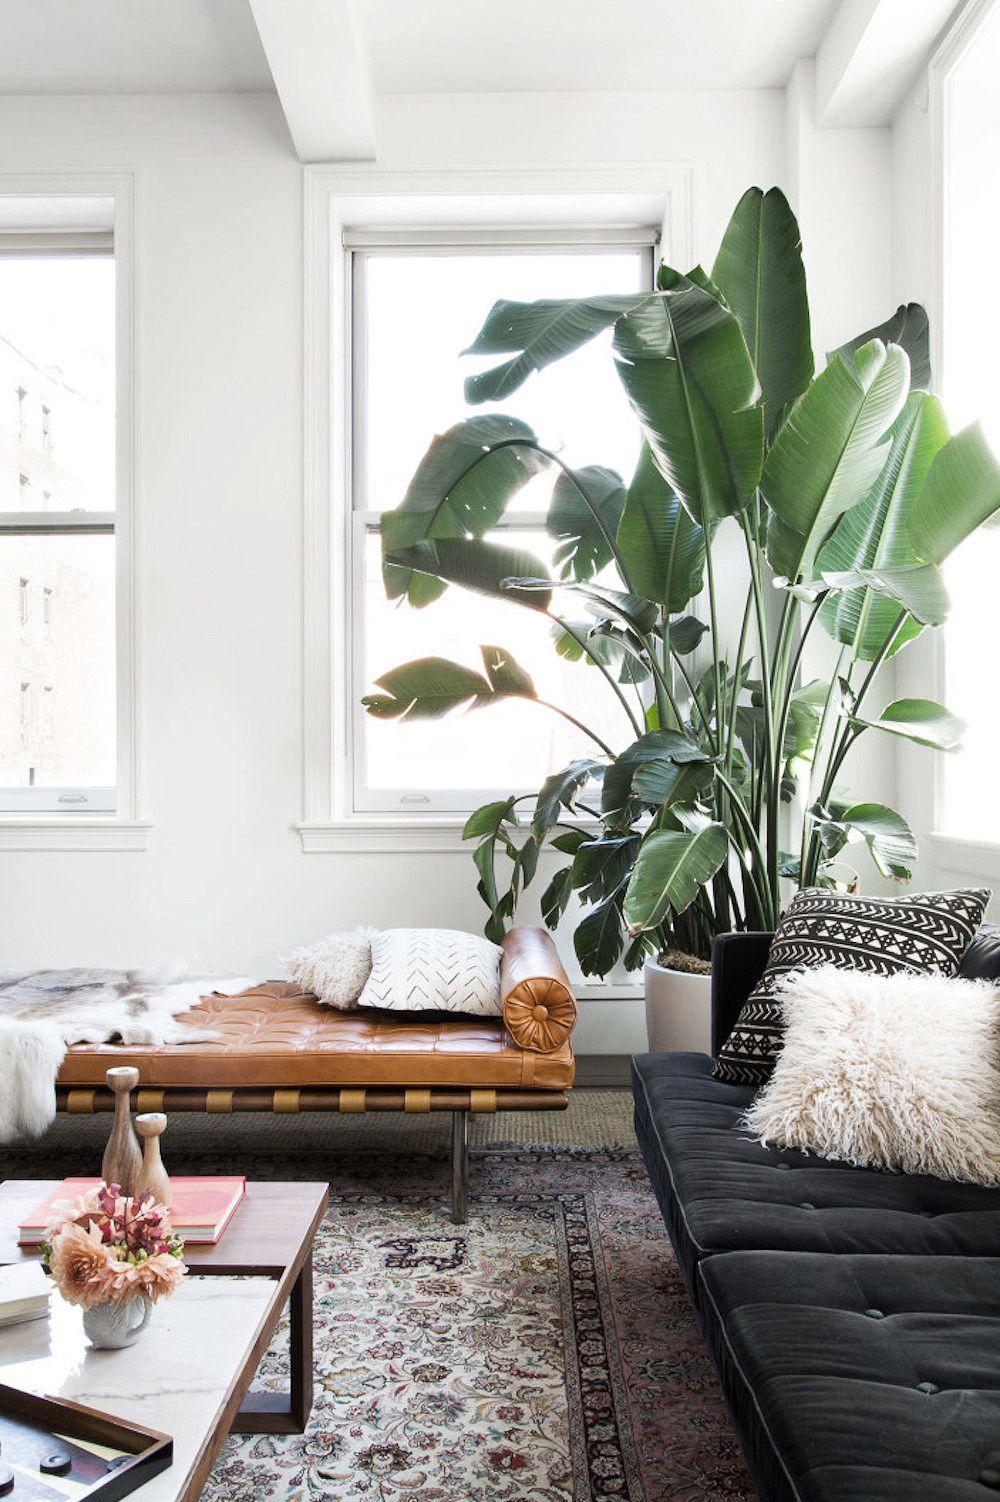 White bird of paradise | plant life | Pinterest | Paradise, Bird and ...